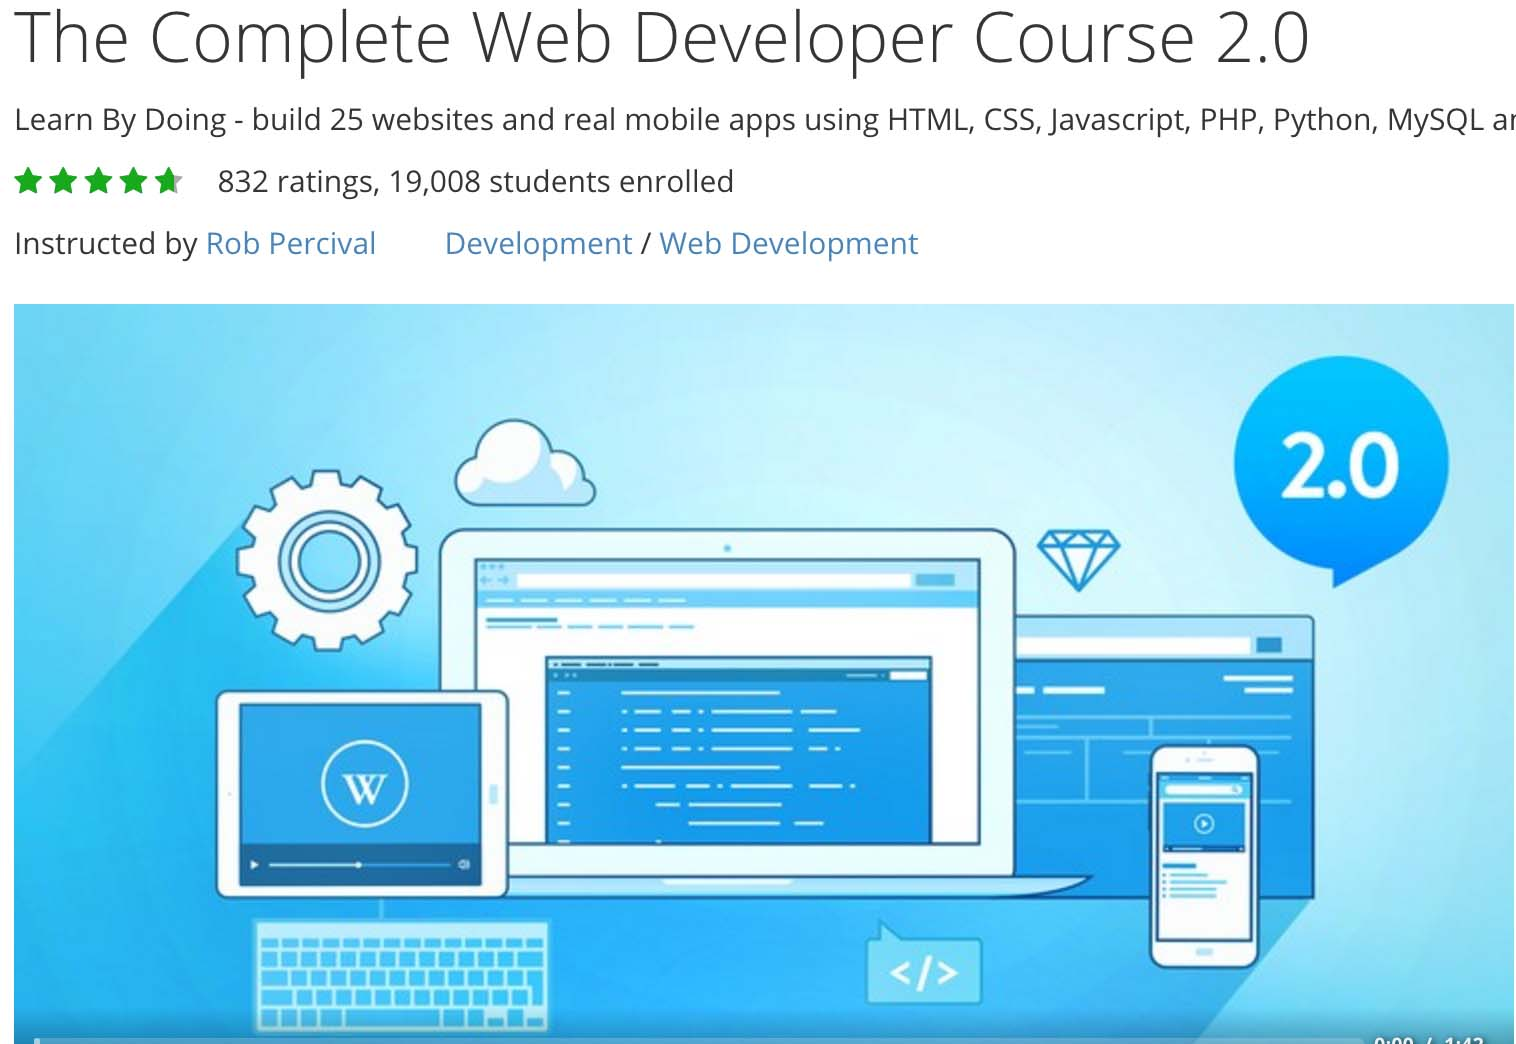 Complete Web Developer Course 2.0 udemy coupon